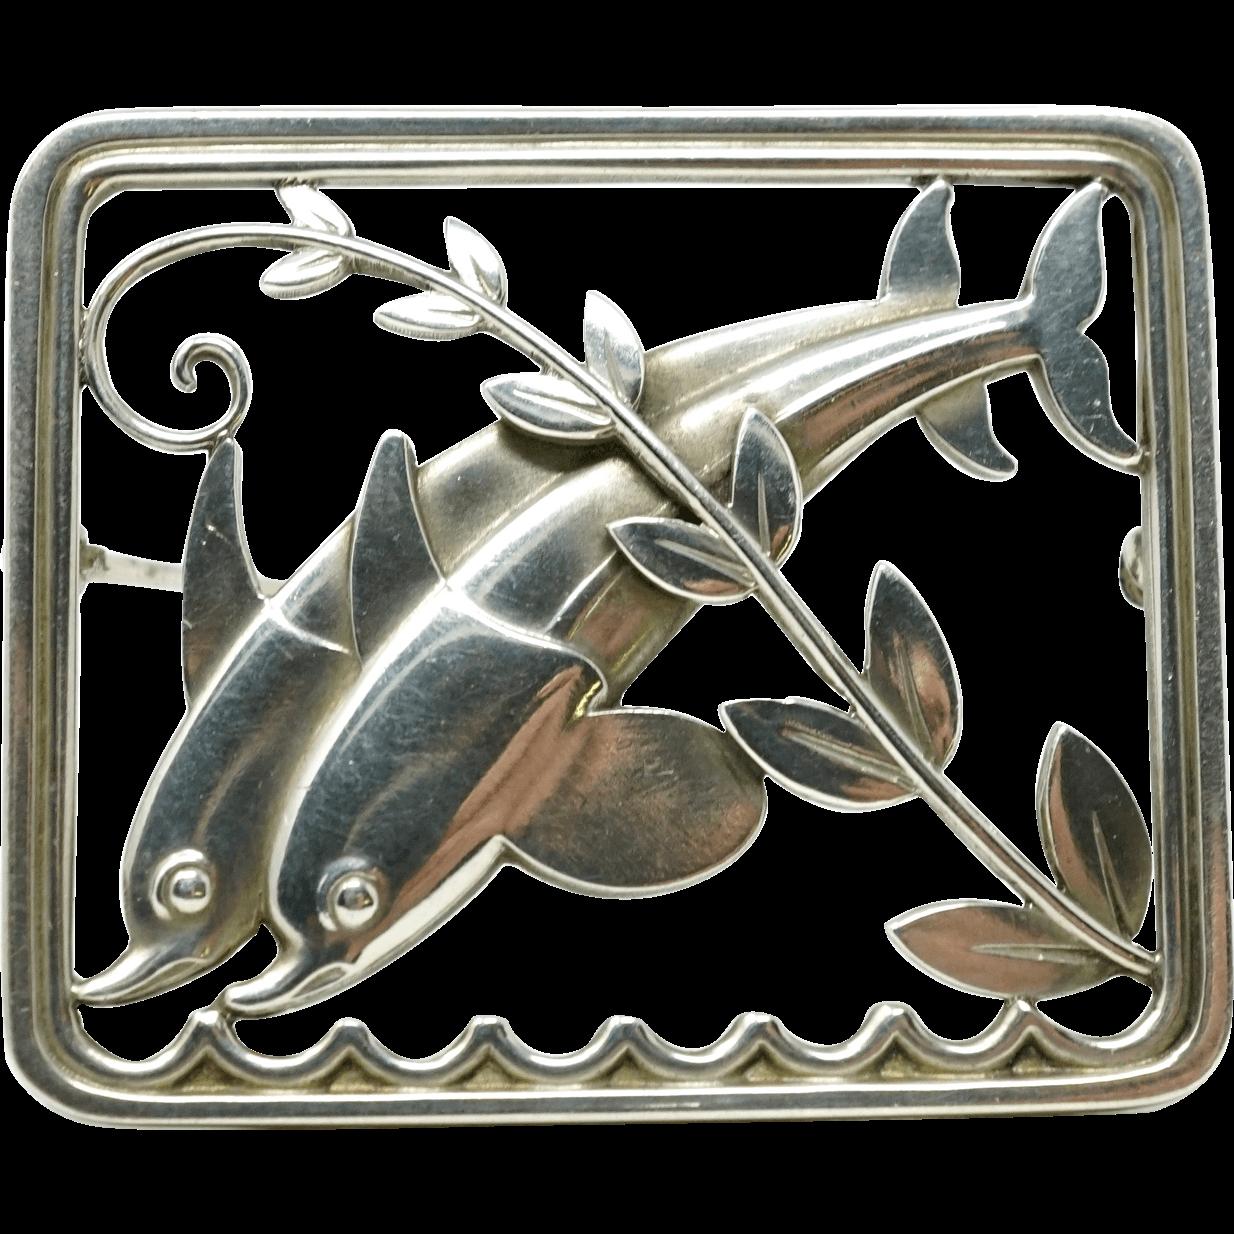 Georg Jensen Arno Malinowski Sterling Silver Dolphin Brooch